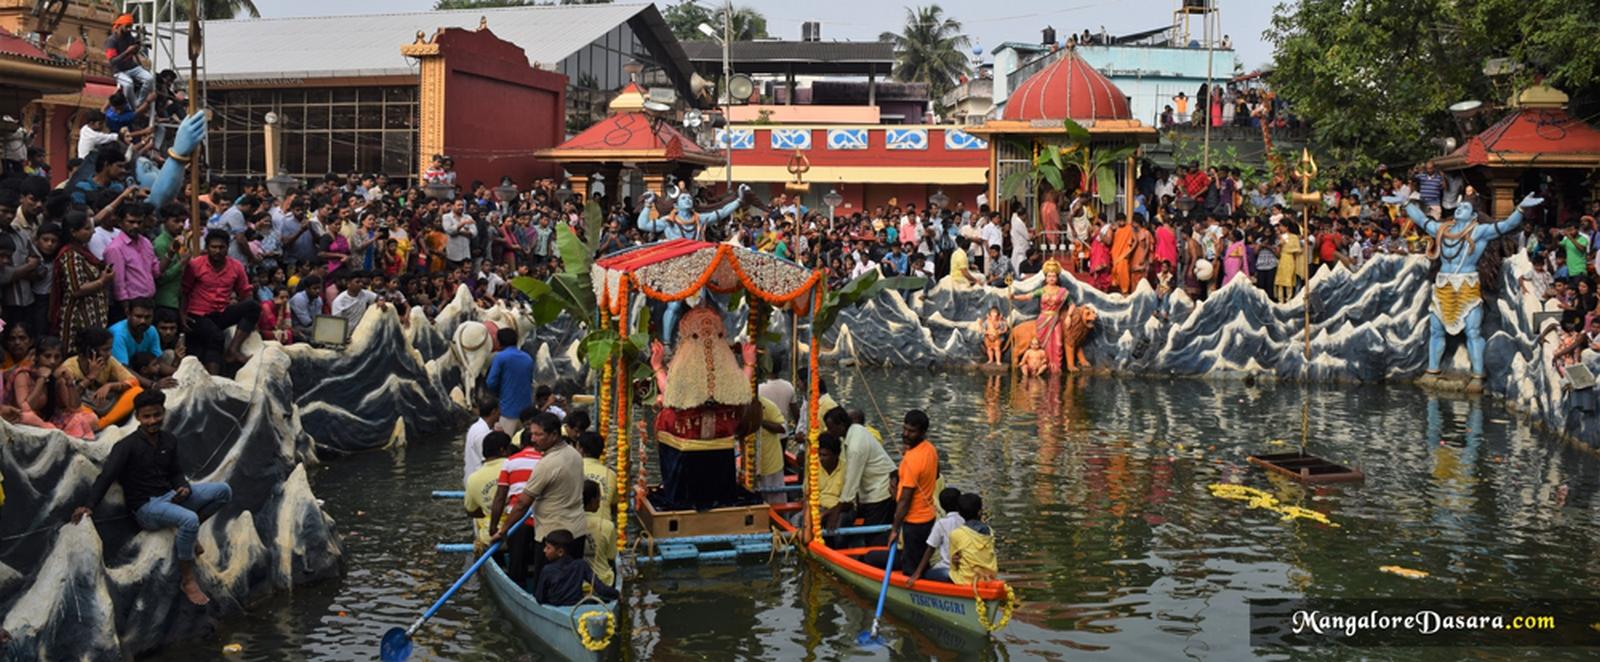 Mangalore Dasara 2017 Images